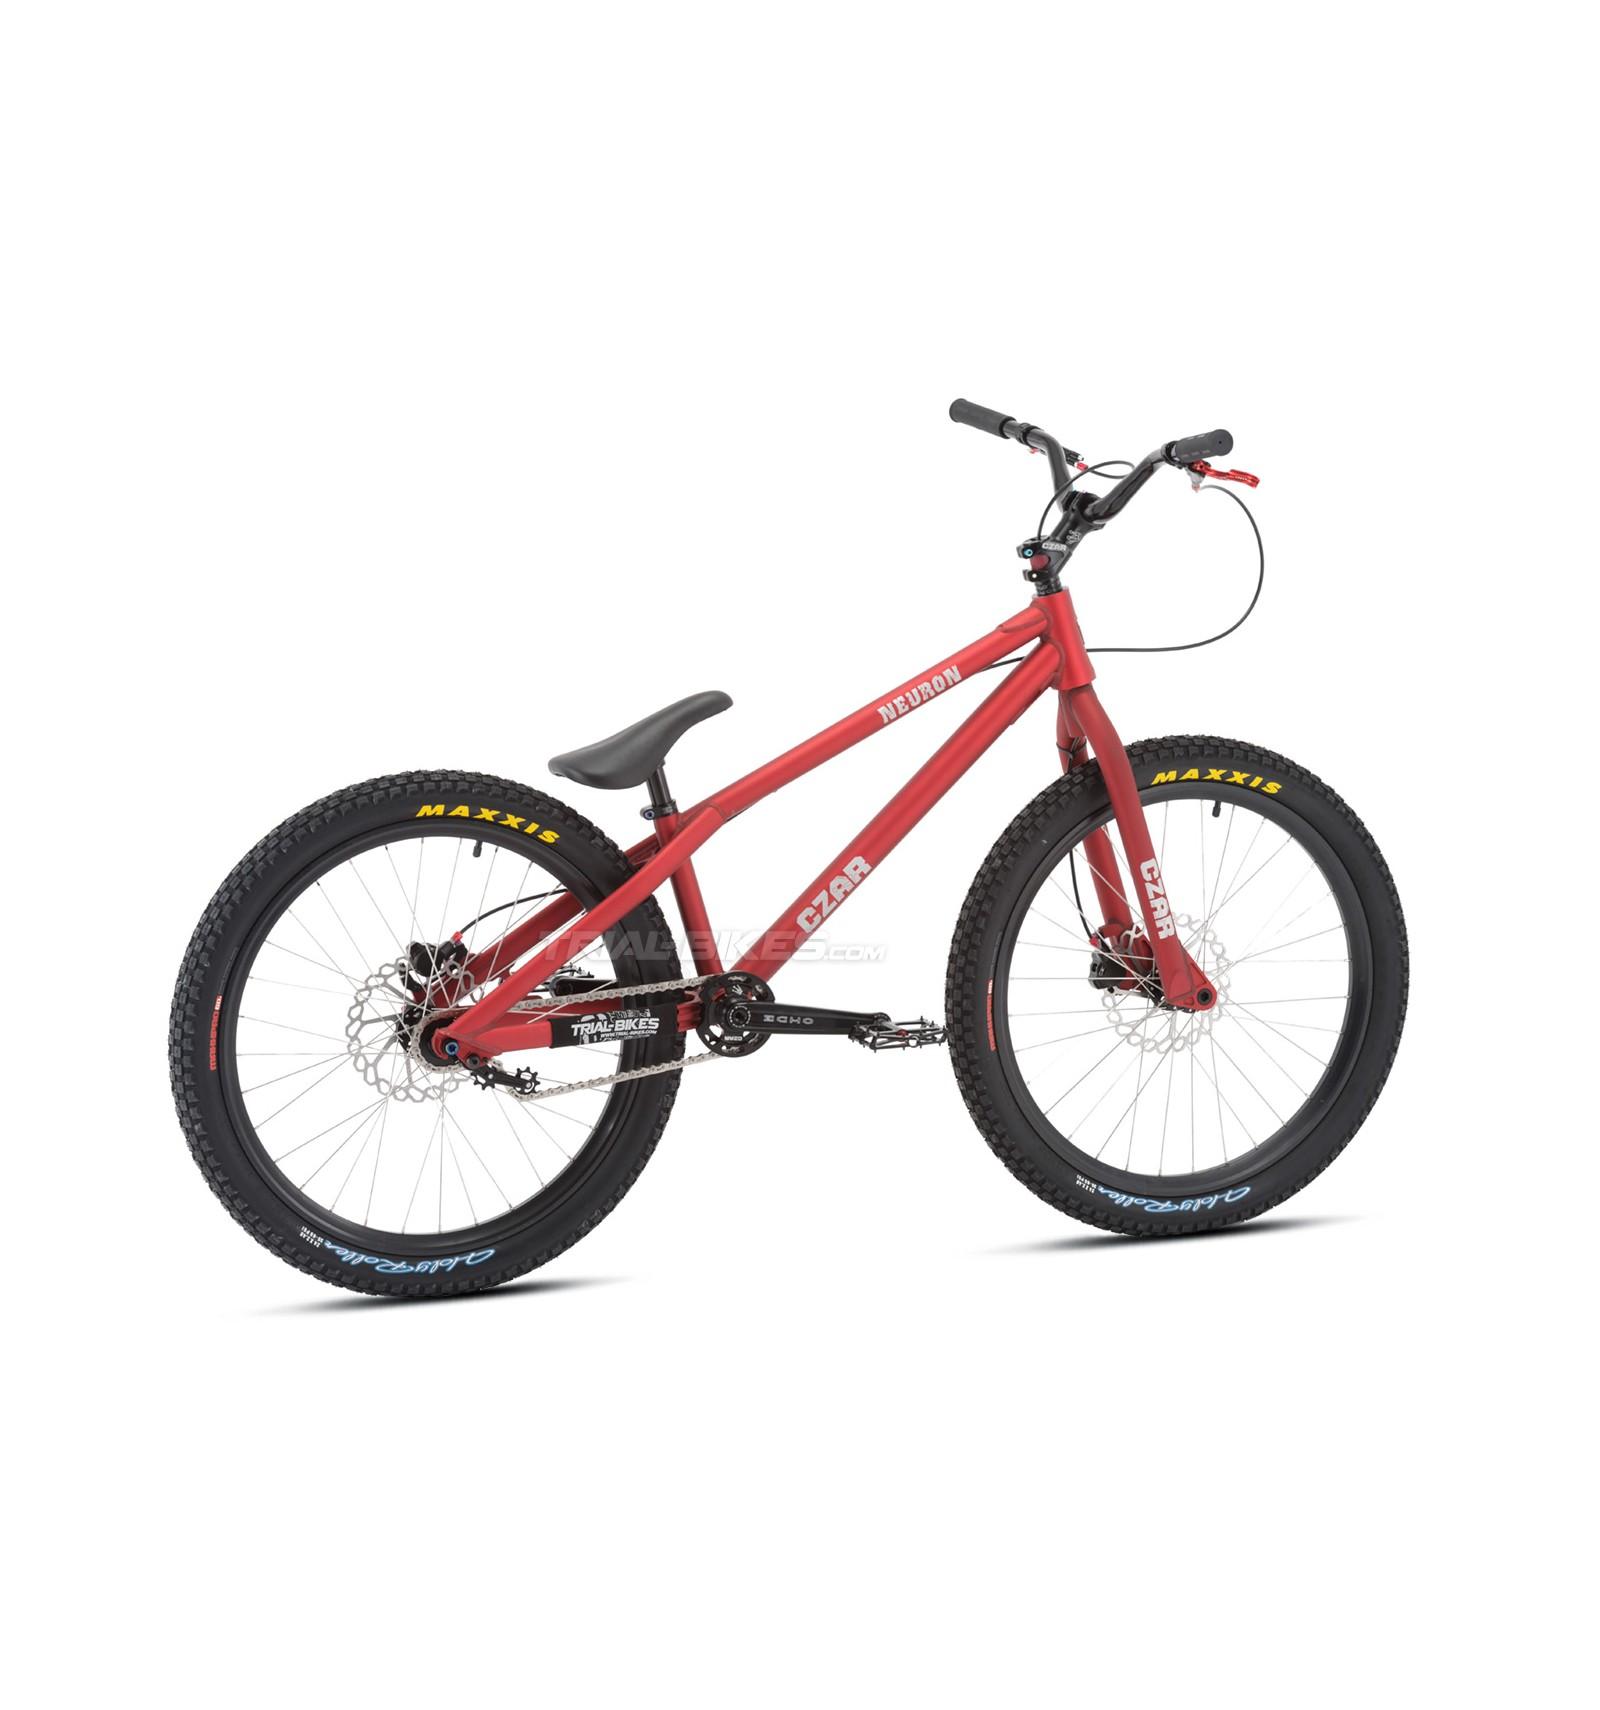 24 trials bike trial bikes